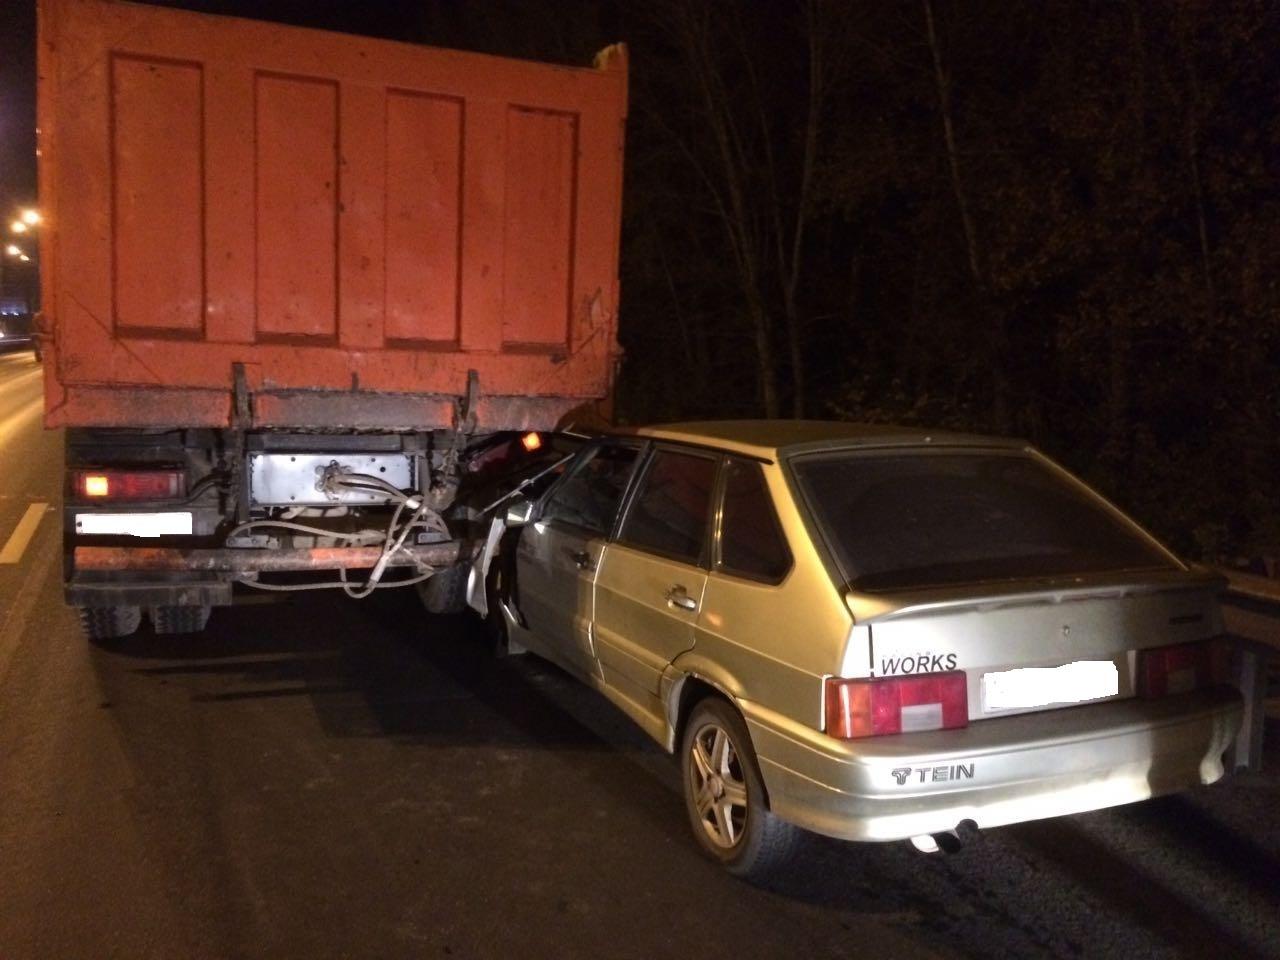 ВУфе «девятка» столкнулась с грузовым автомобилем - пострадал младенец